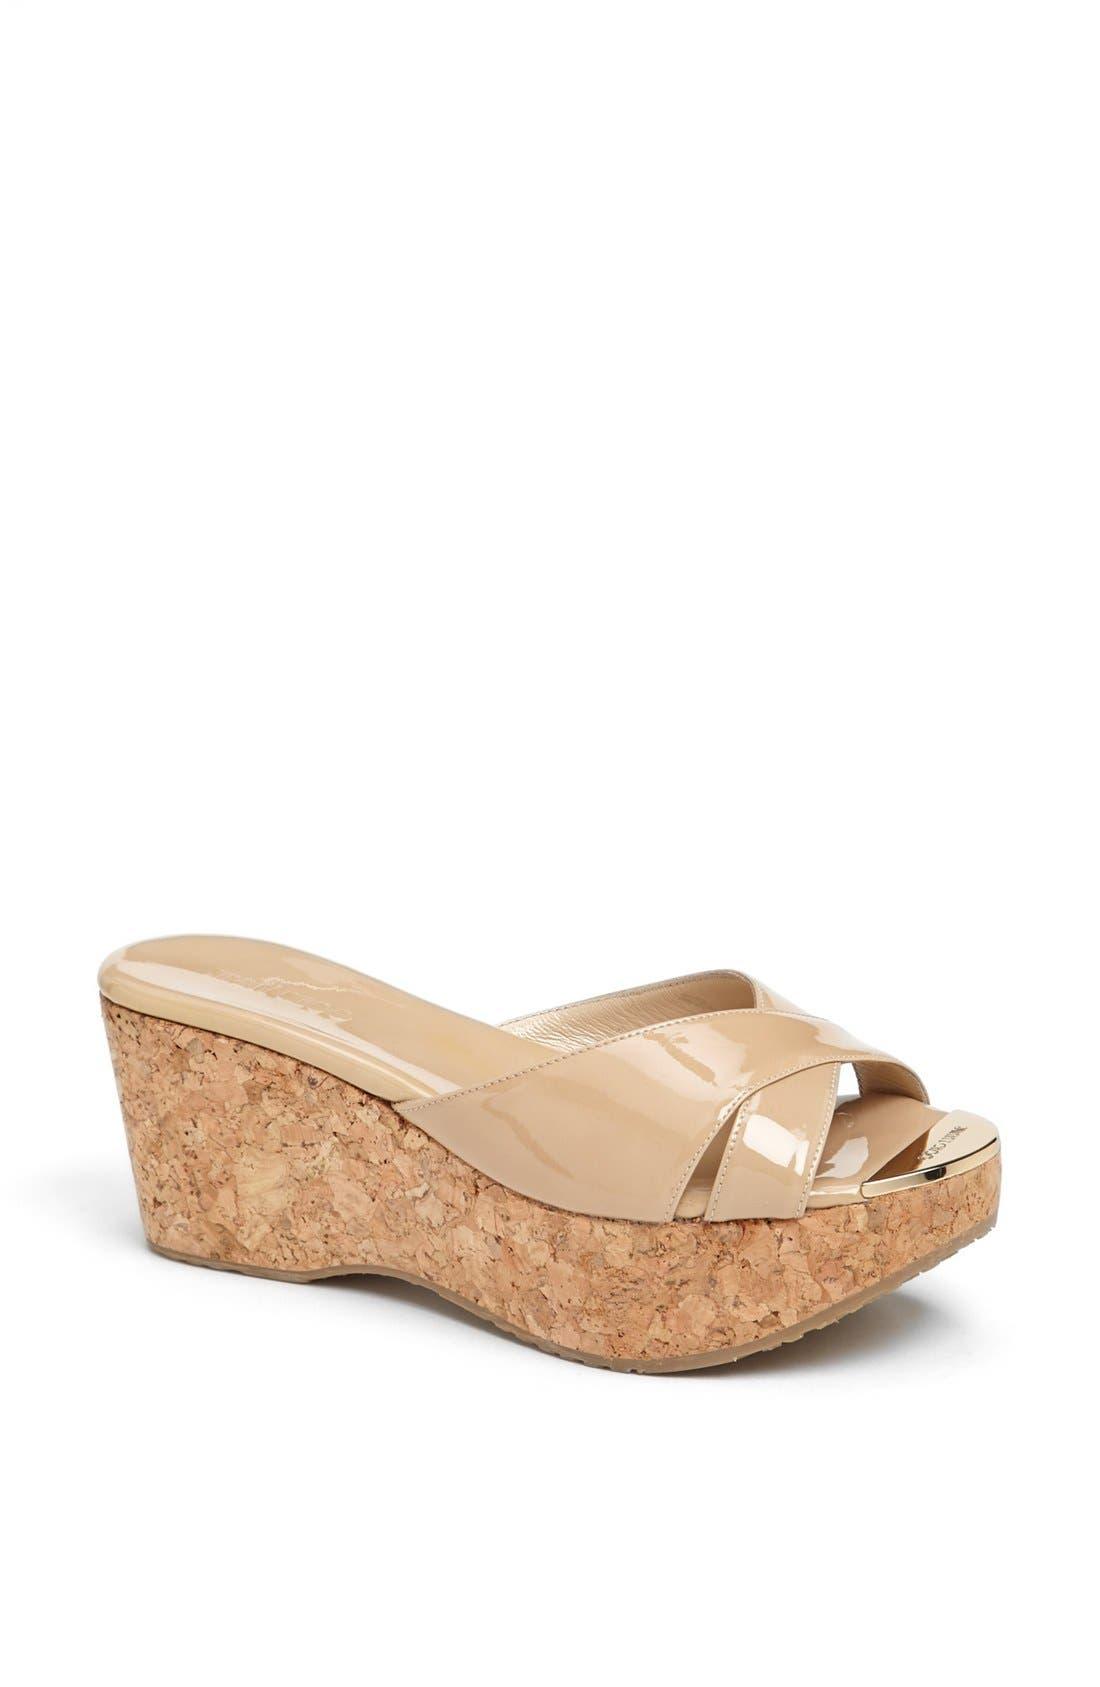 Alternate Image 1 Selected - Jimmy Choo 'Prima' Cork Platform Sandal (Women)